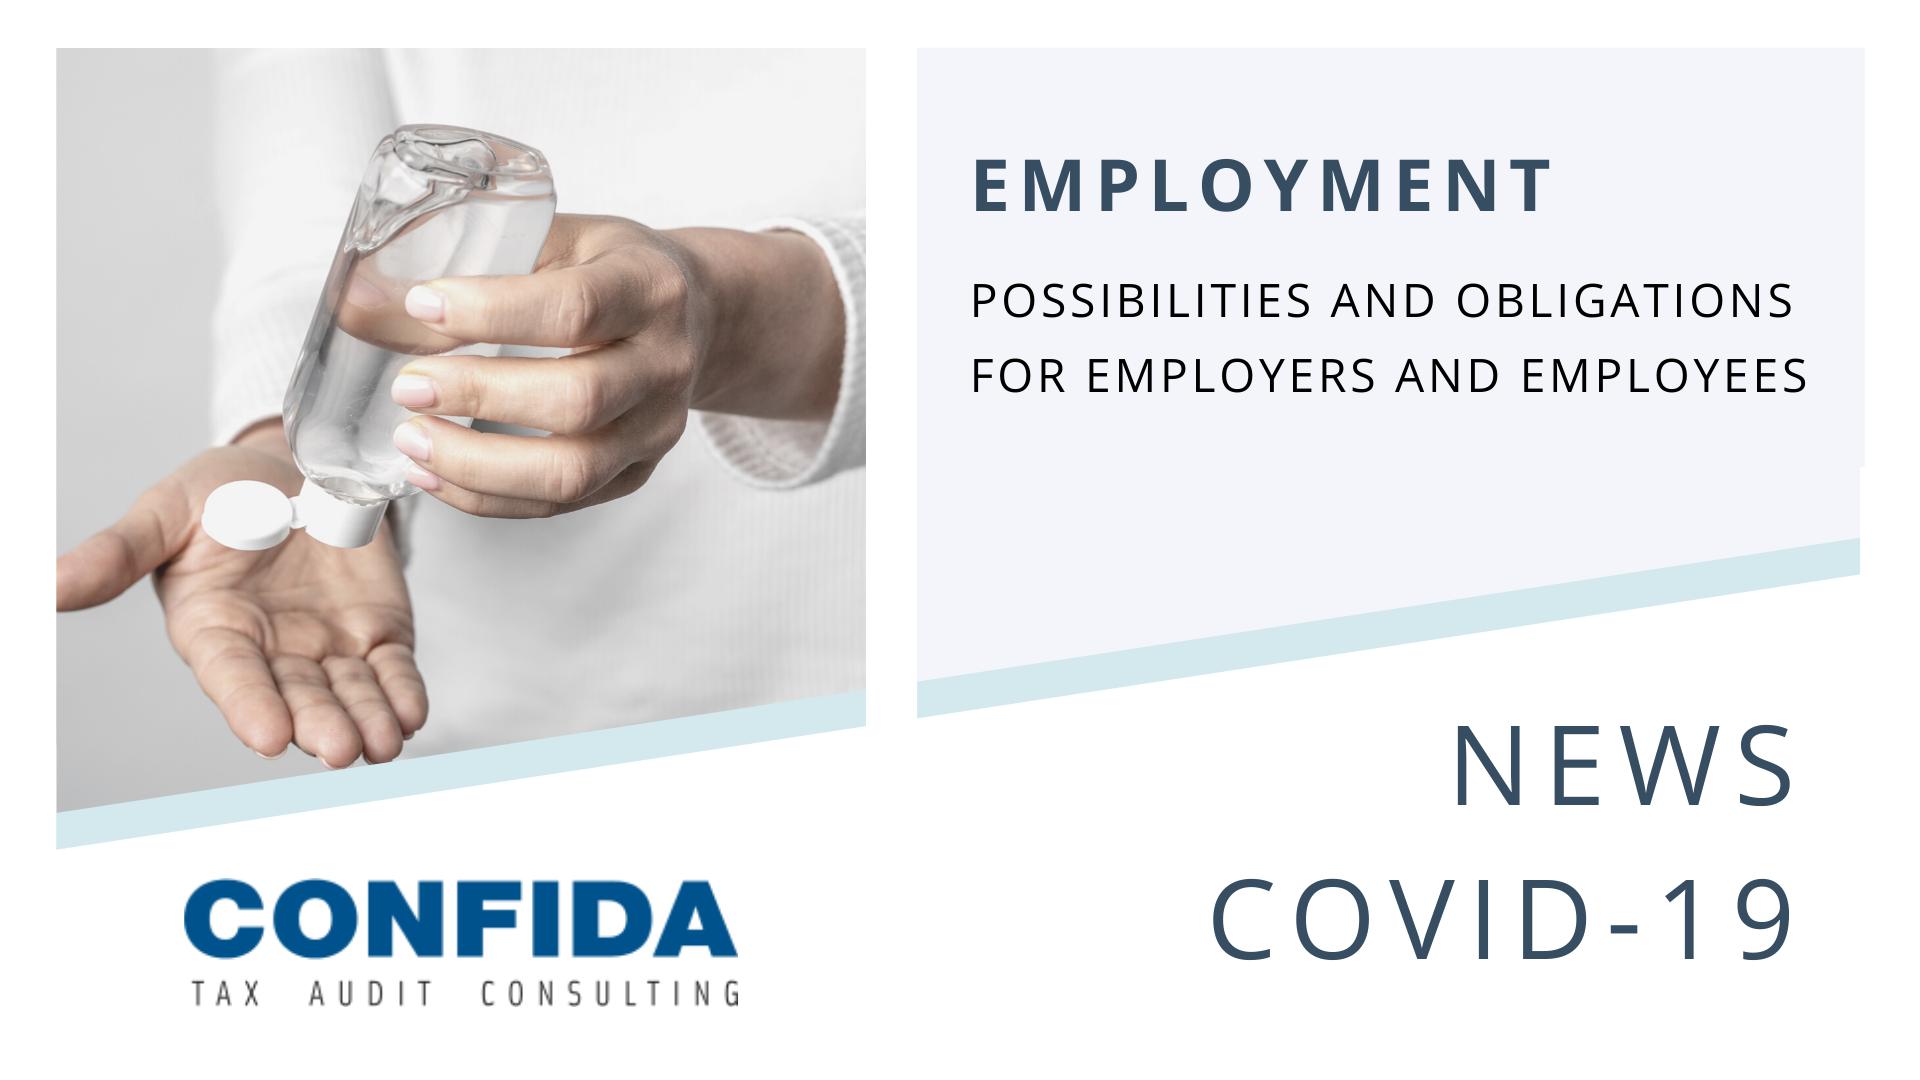 COVID-19: Employment